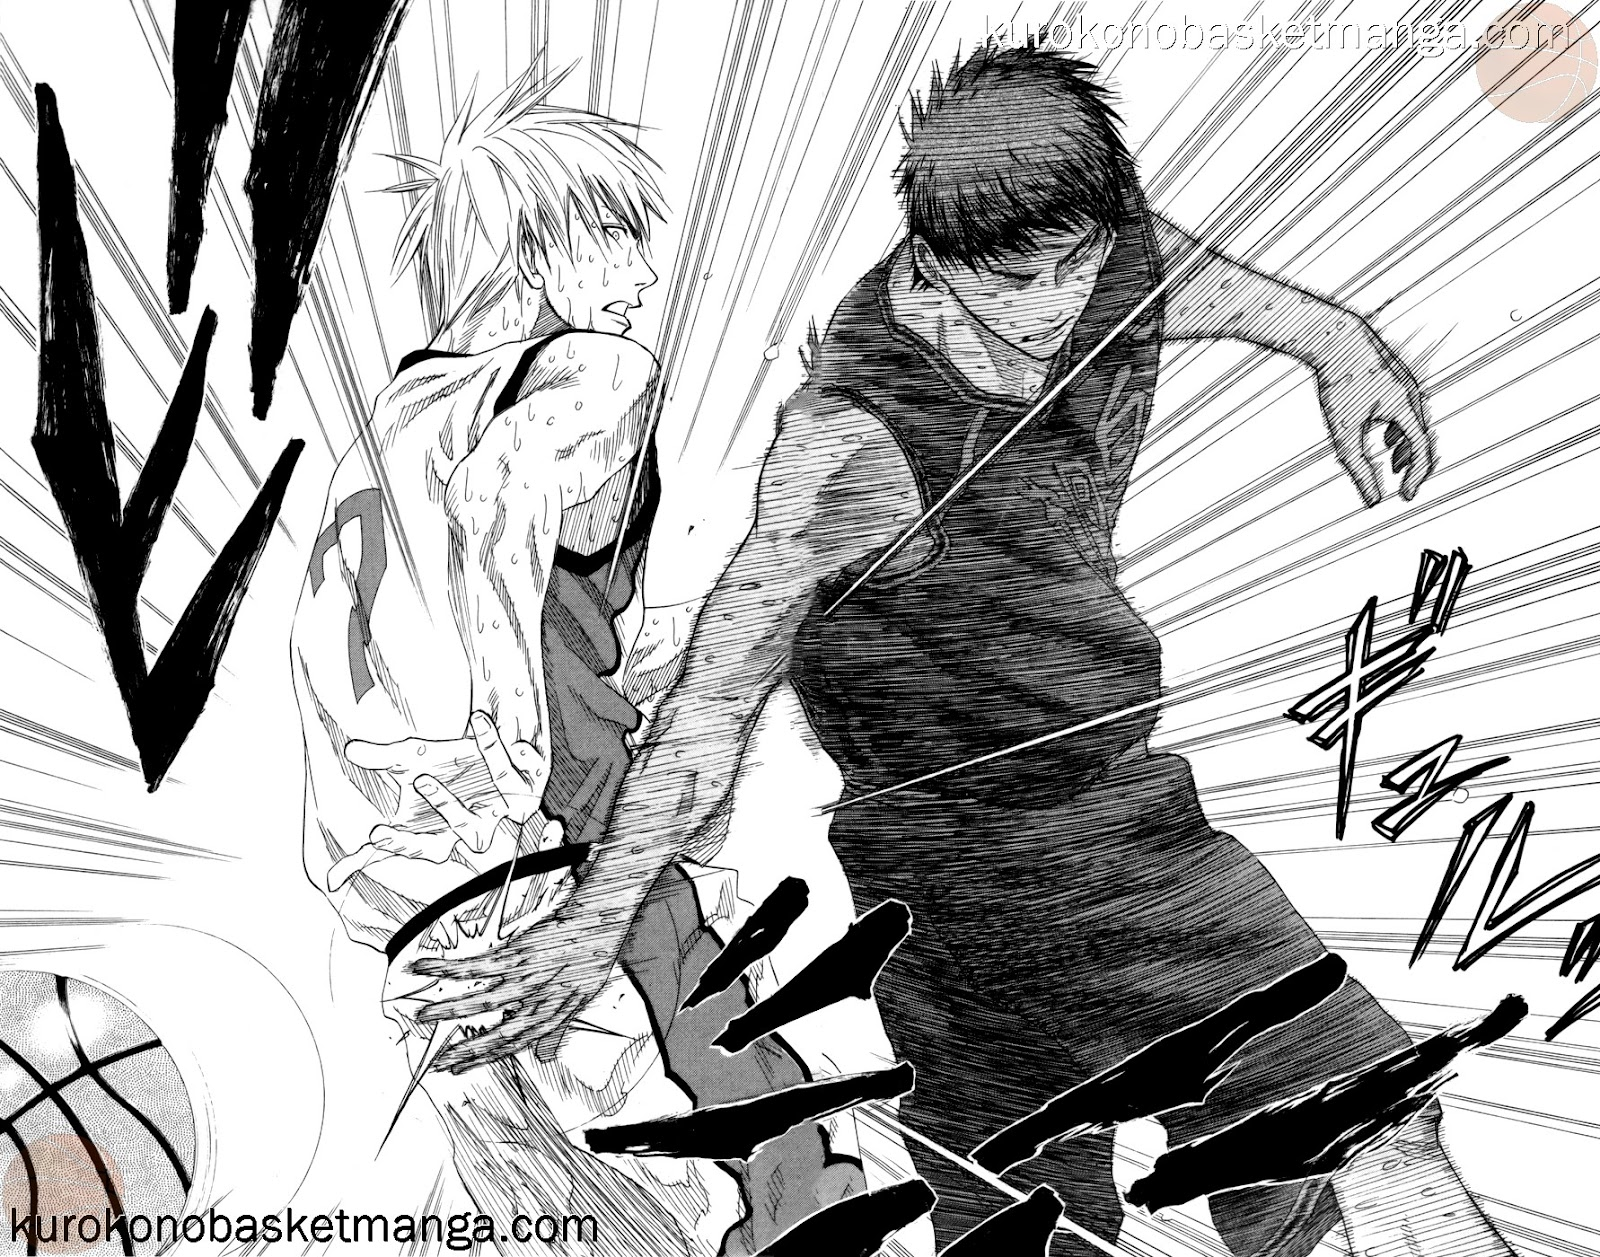 Kuroko no Basket Manga Chapter 72 - Image 08-09